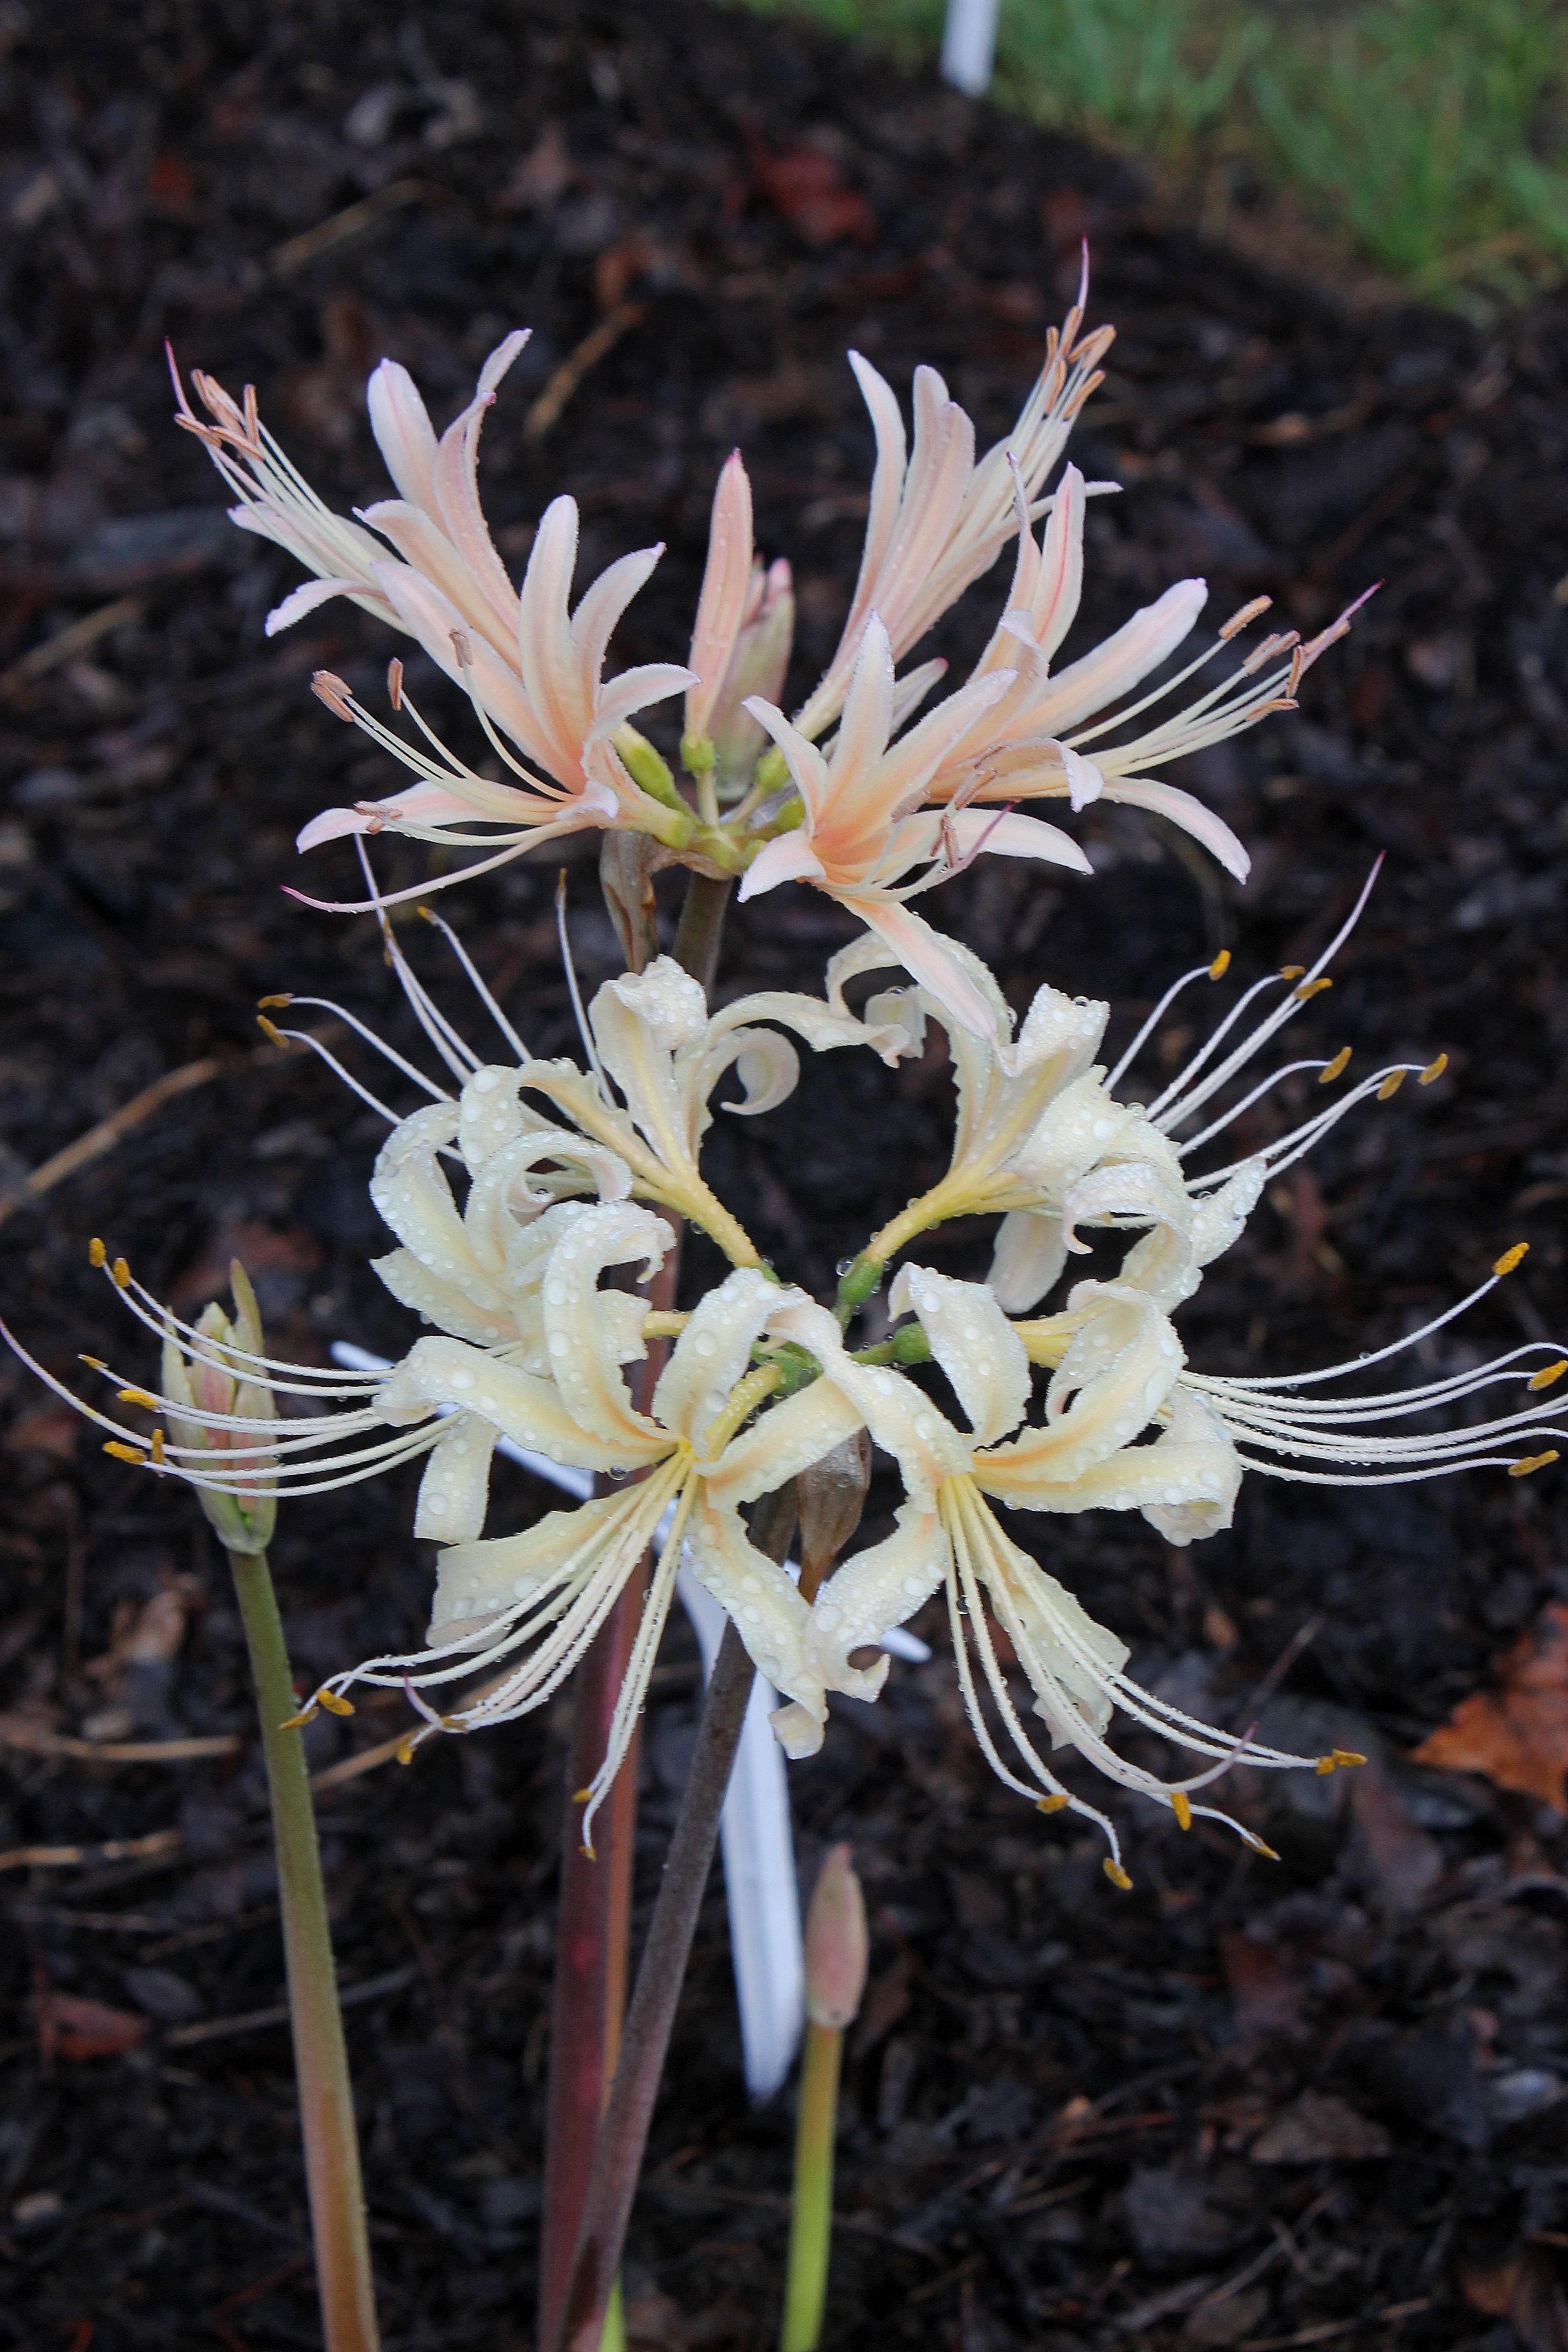 Lycoris x albiflora 'Gridlian' foliage @ JLBG (aka: Lycoris x albiflora Jimmy Gridlian's Oakhurst clone) - a hybrid of Lycoris aurea x radiata